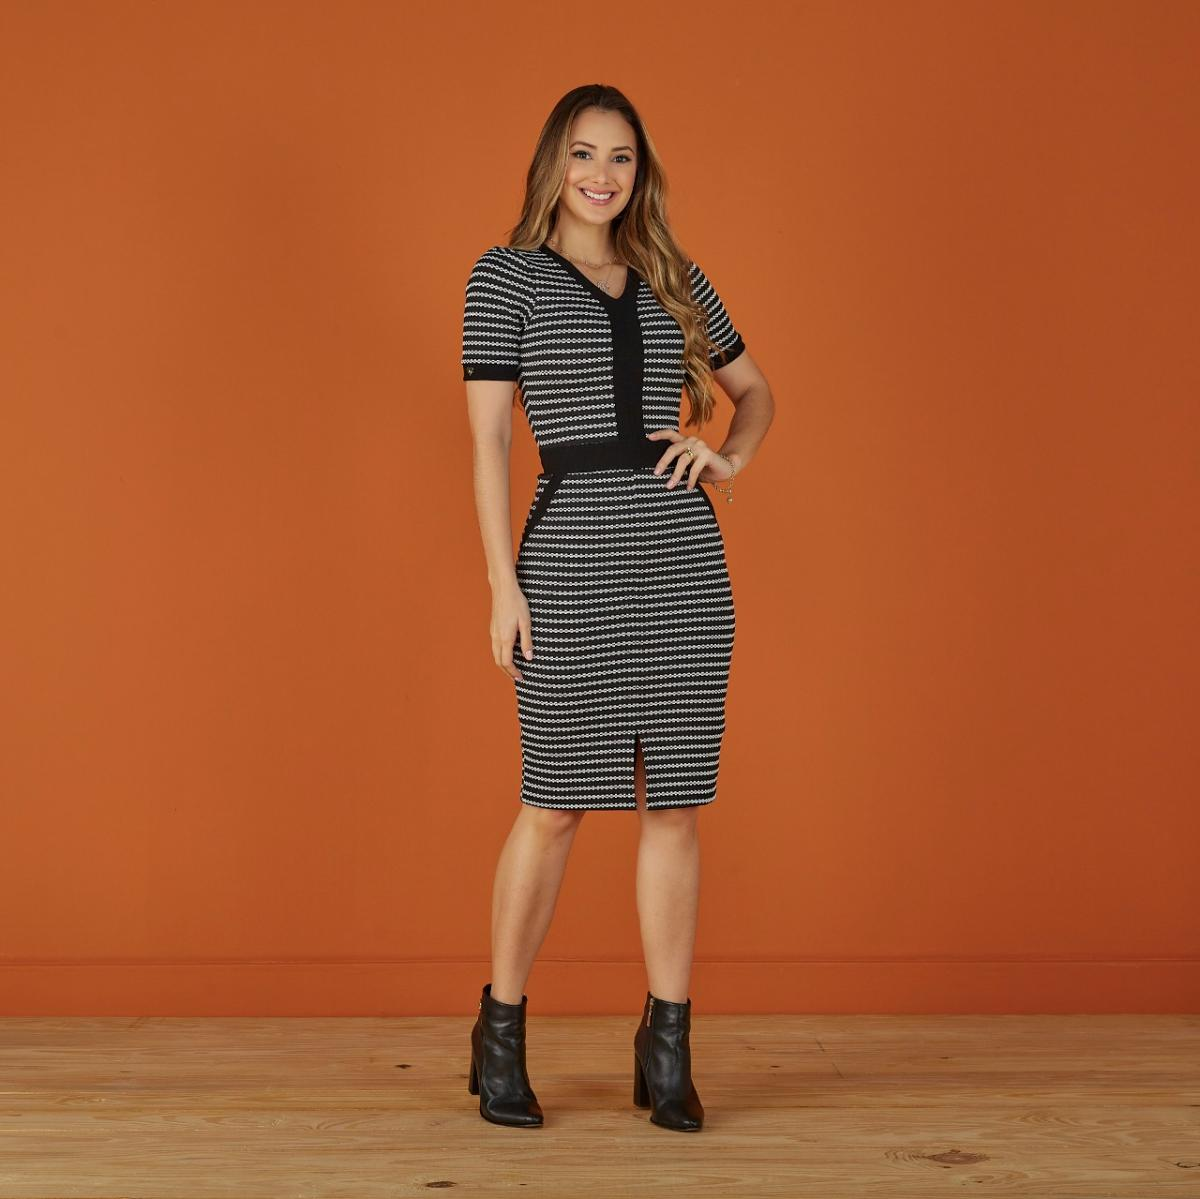 Vestido Michele no Neoprene Jacquard, Moda Evangélica - Tatá Martello